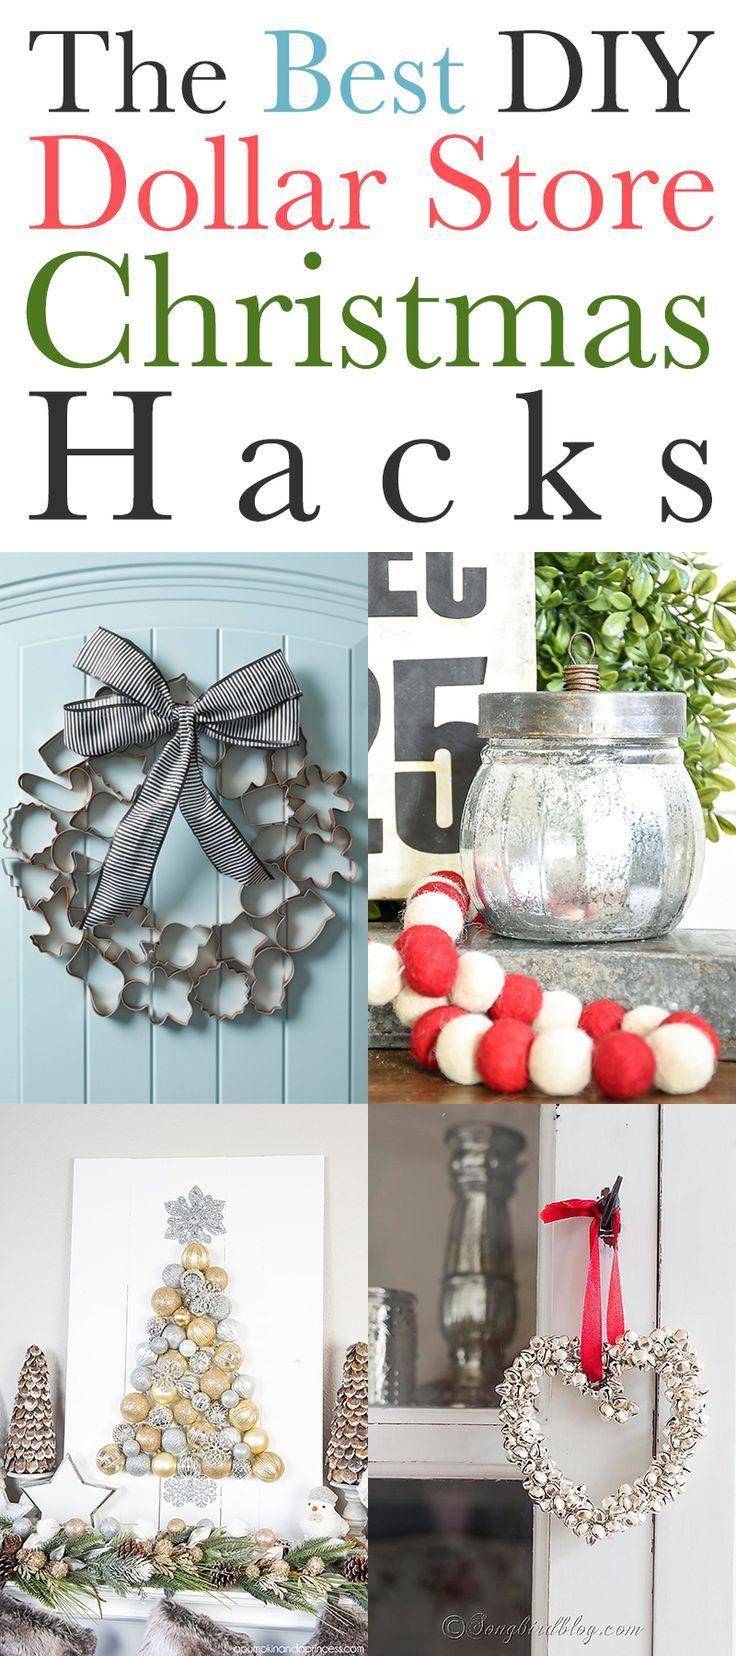 The Best DIY Dollar Store Christmas Hacks #dollarstorechristmascrafts